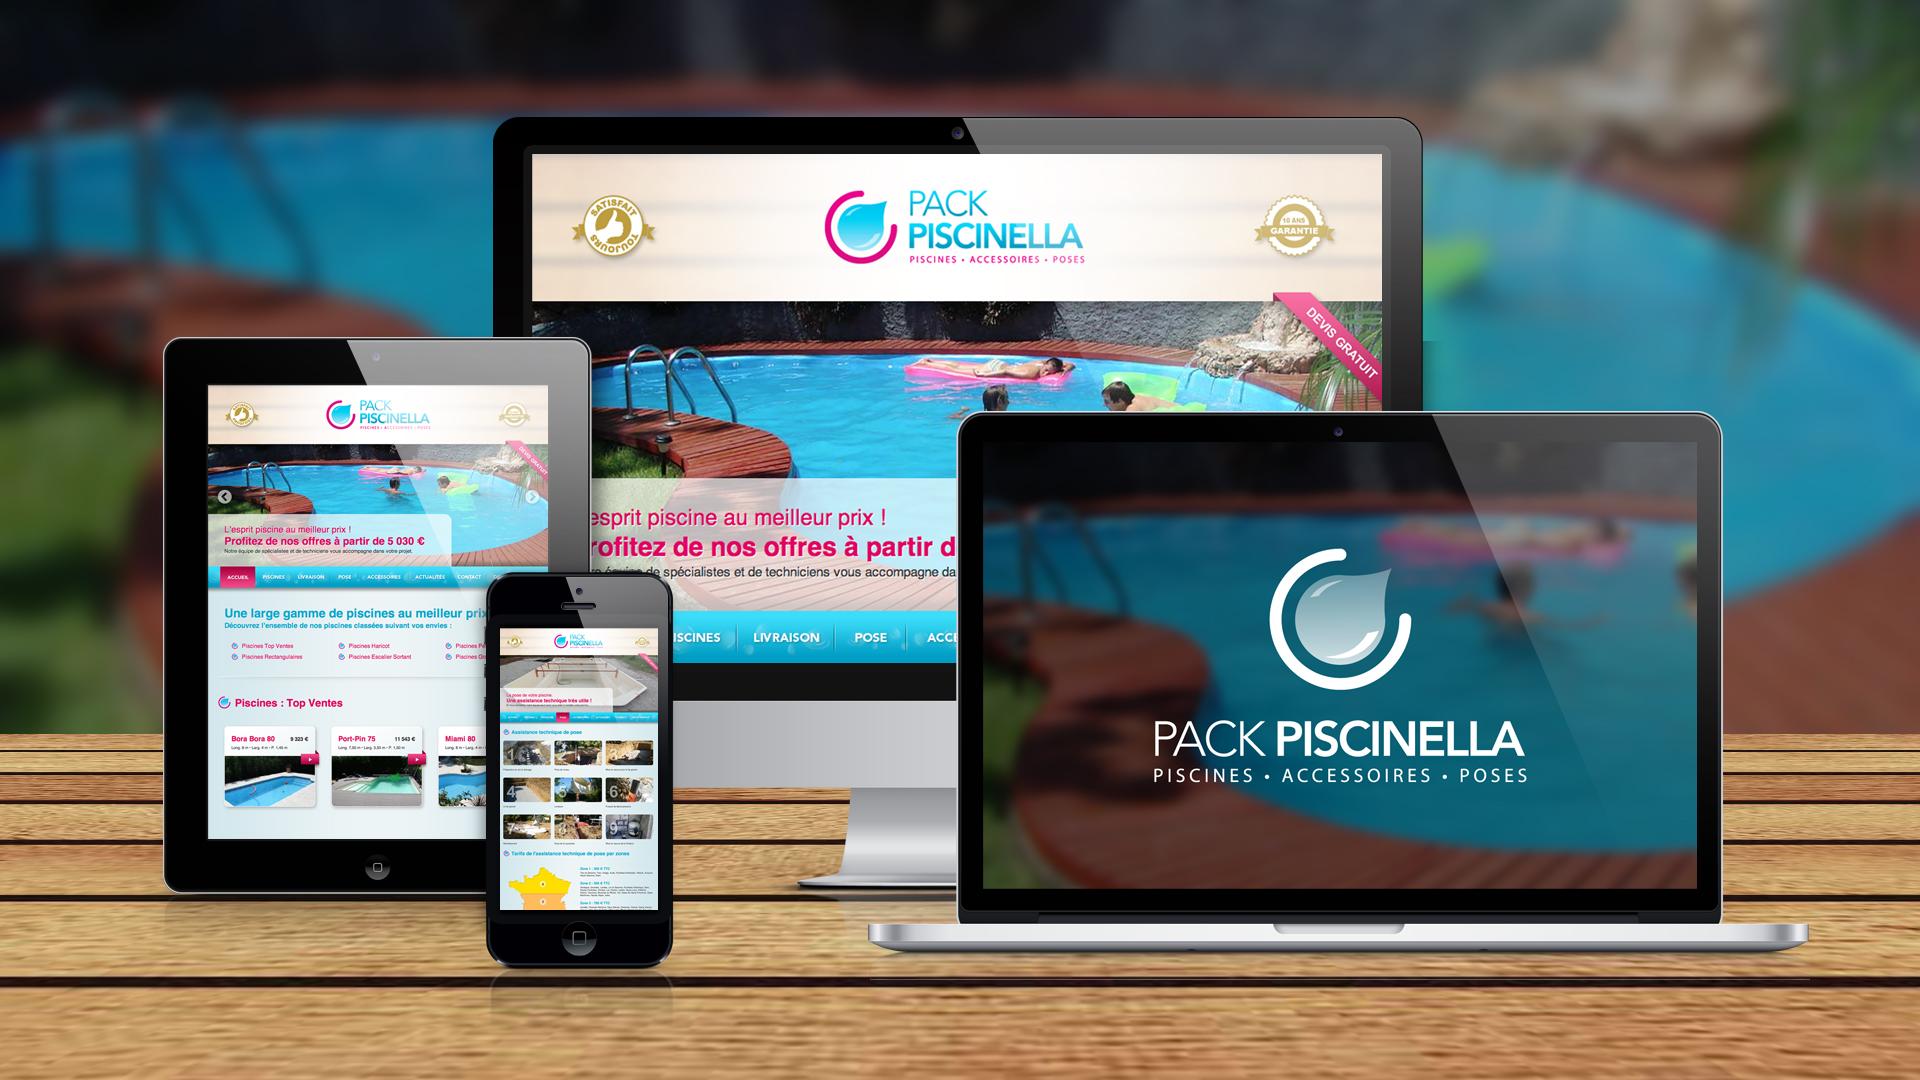 pack-piscinella-creation-logo-site-internet-communication-caconcept-alexis-cretin-graphiste